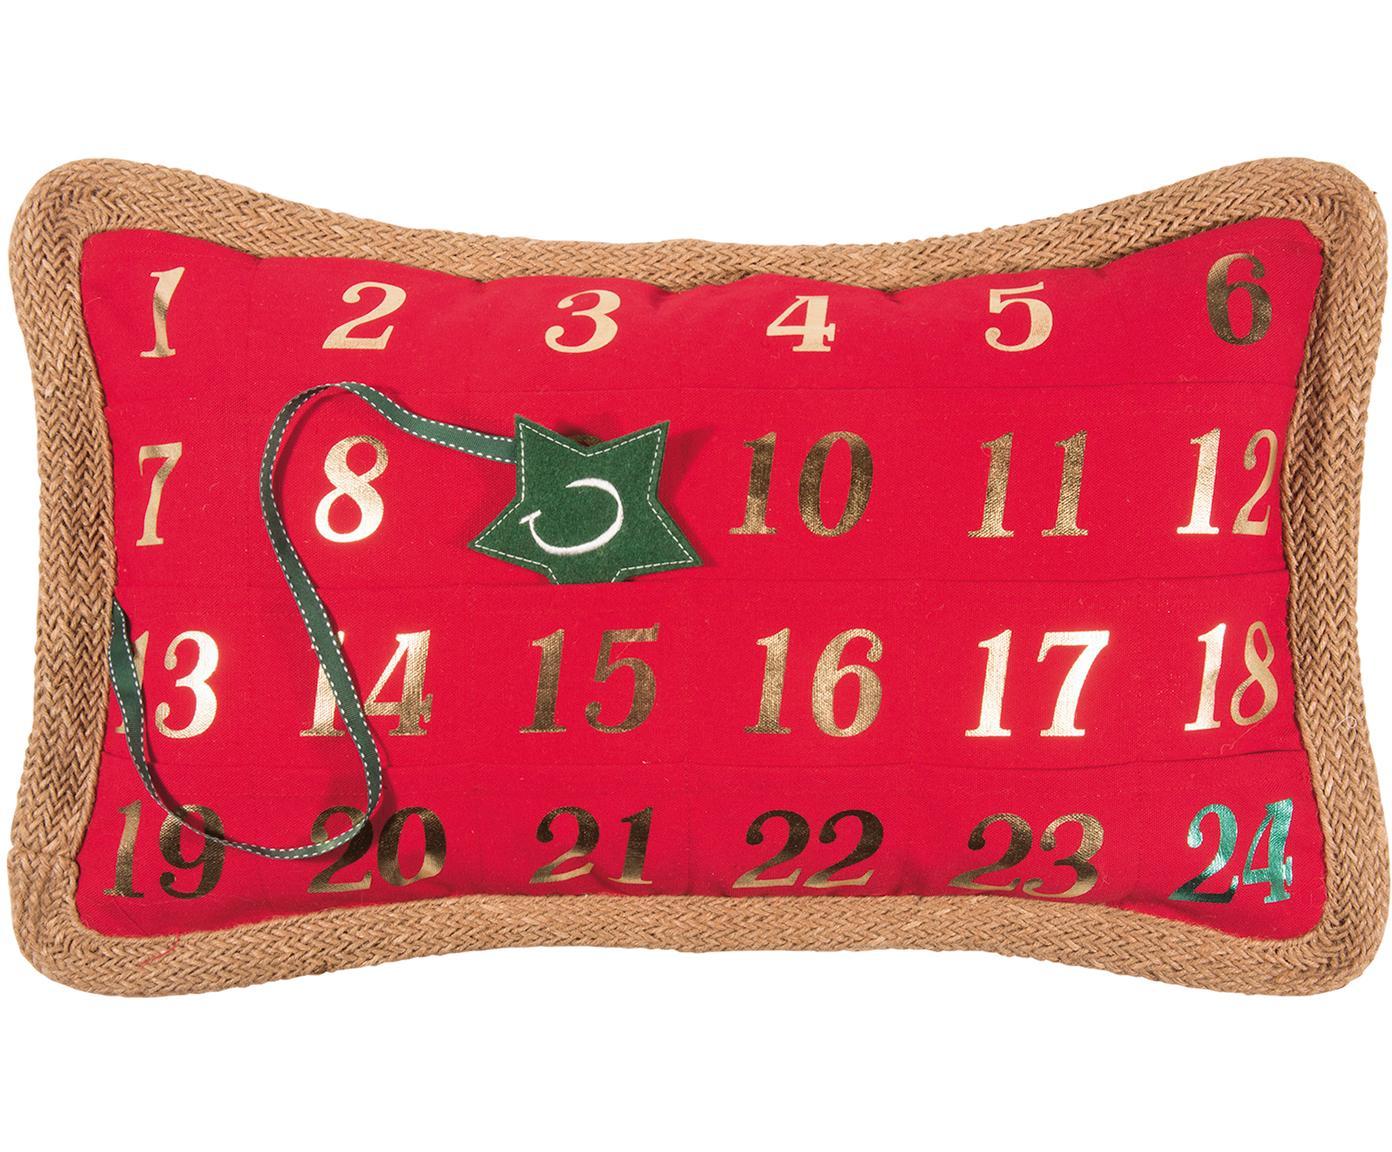 Kussenhoes Advent, 95% polyester, 5% linnen, Rood, groen, 35 x 60 cm